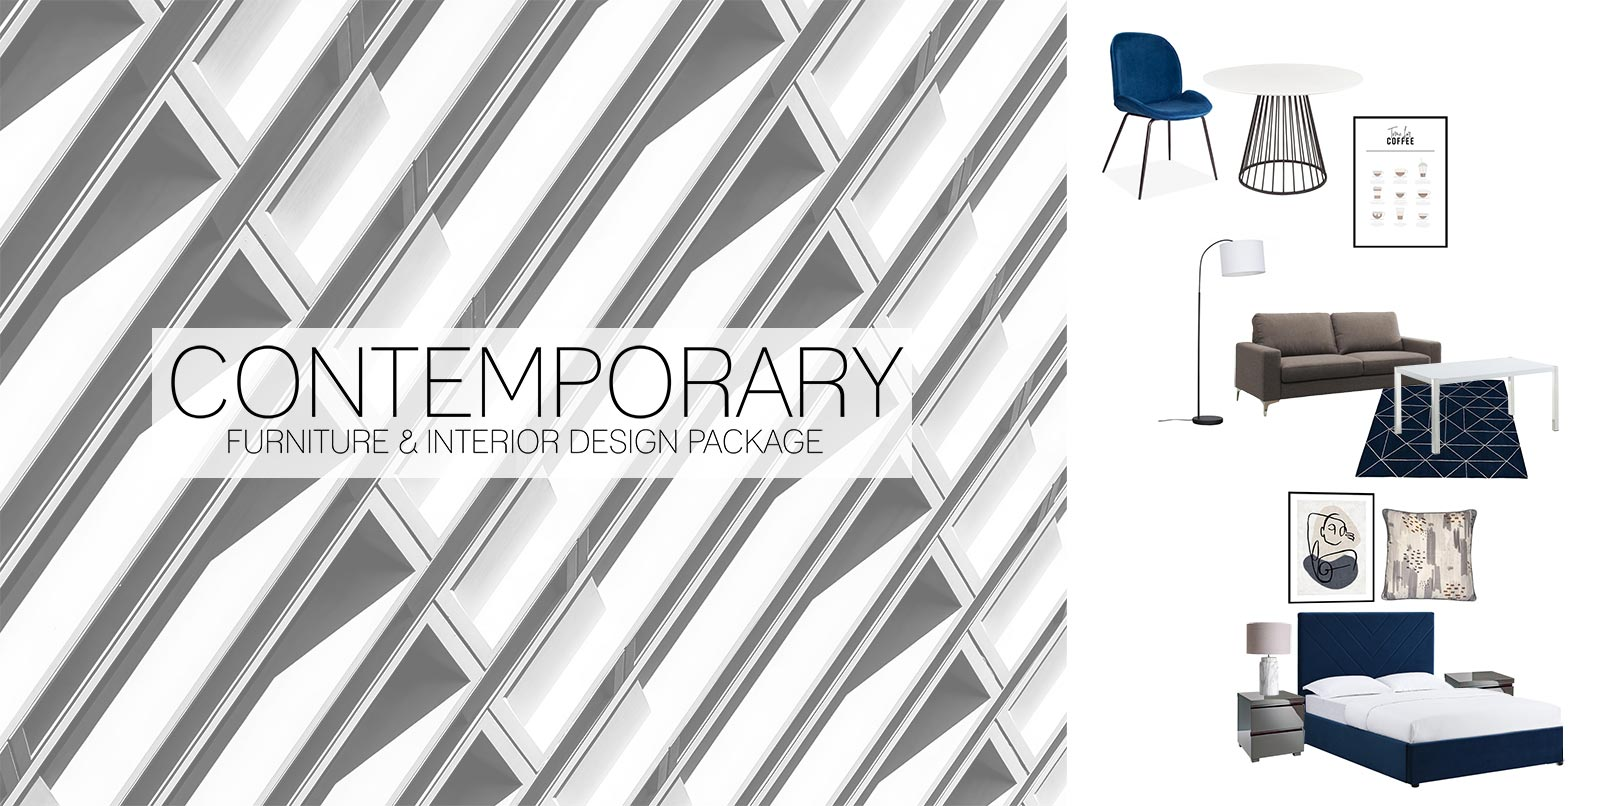 Contemporary Furniture Interior Design Package